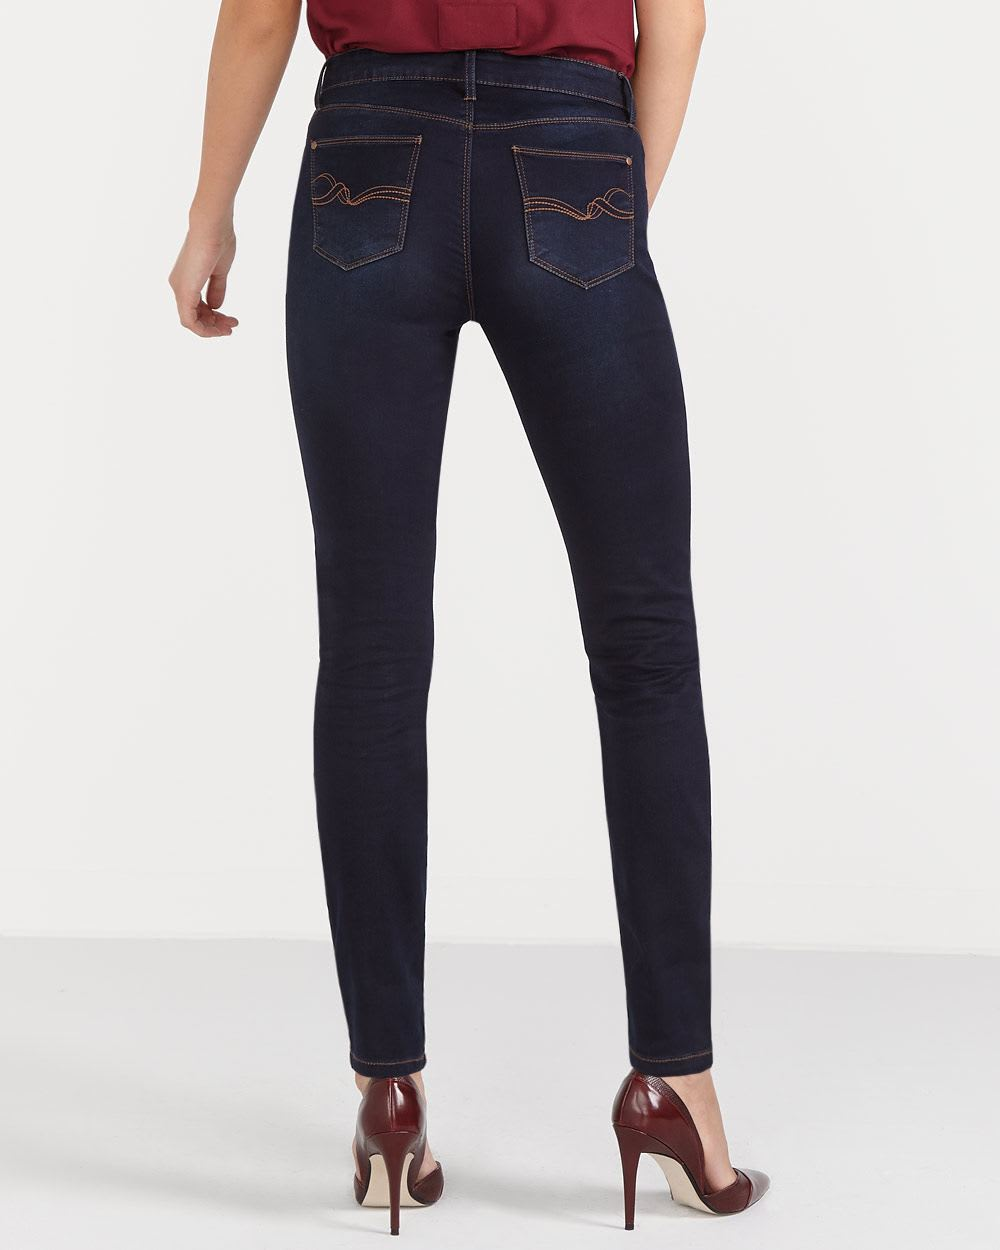 The Petite Signature Soft Skinny Jeans